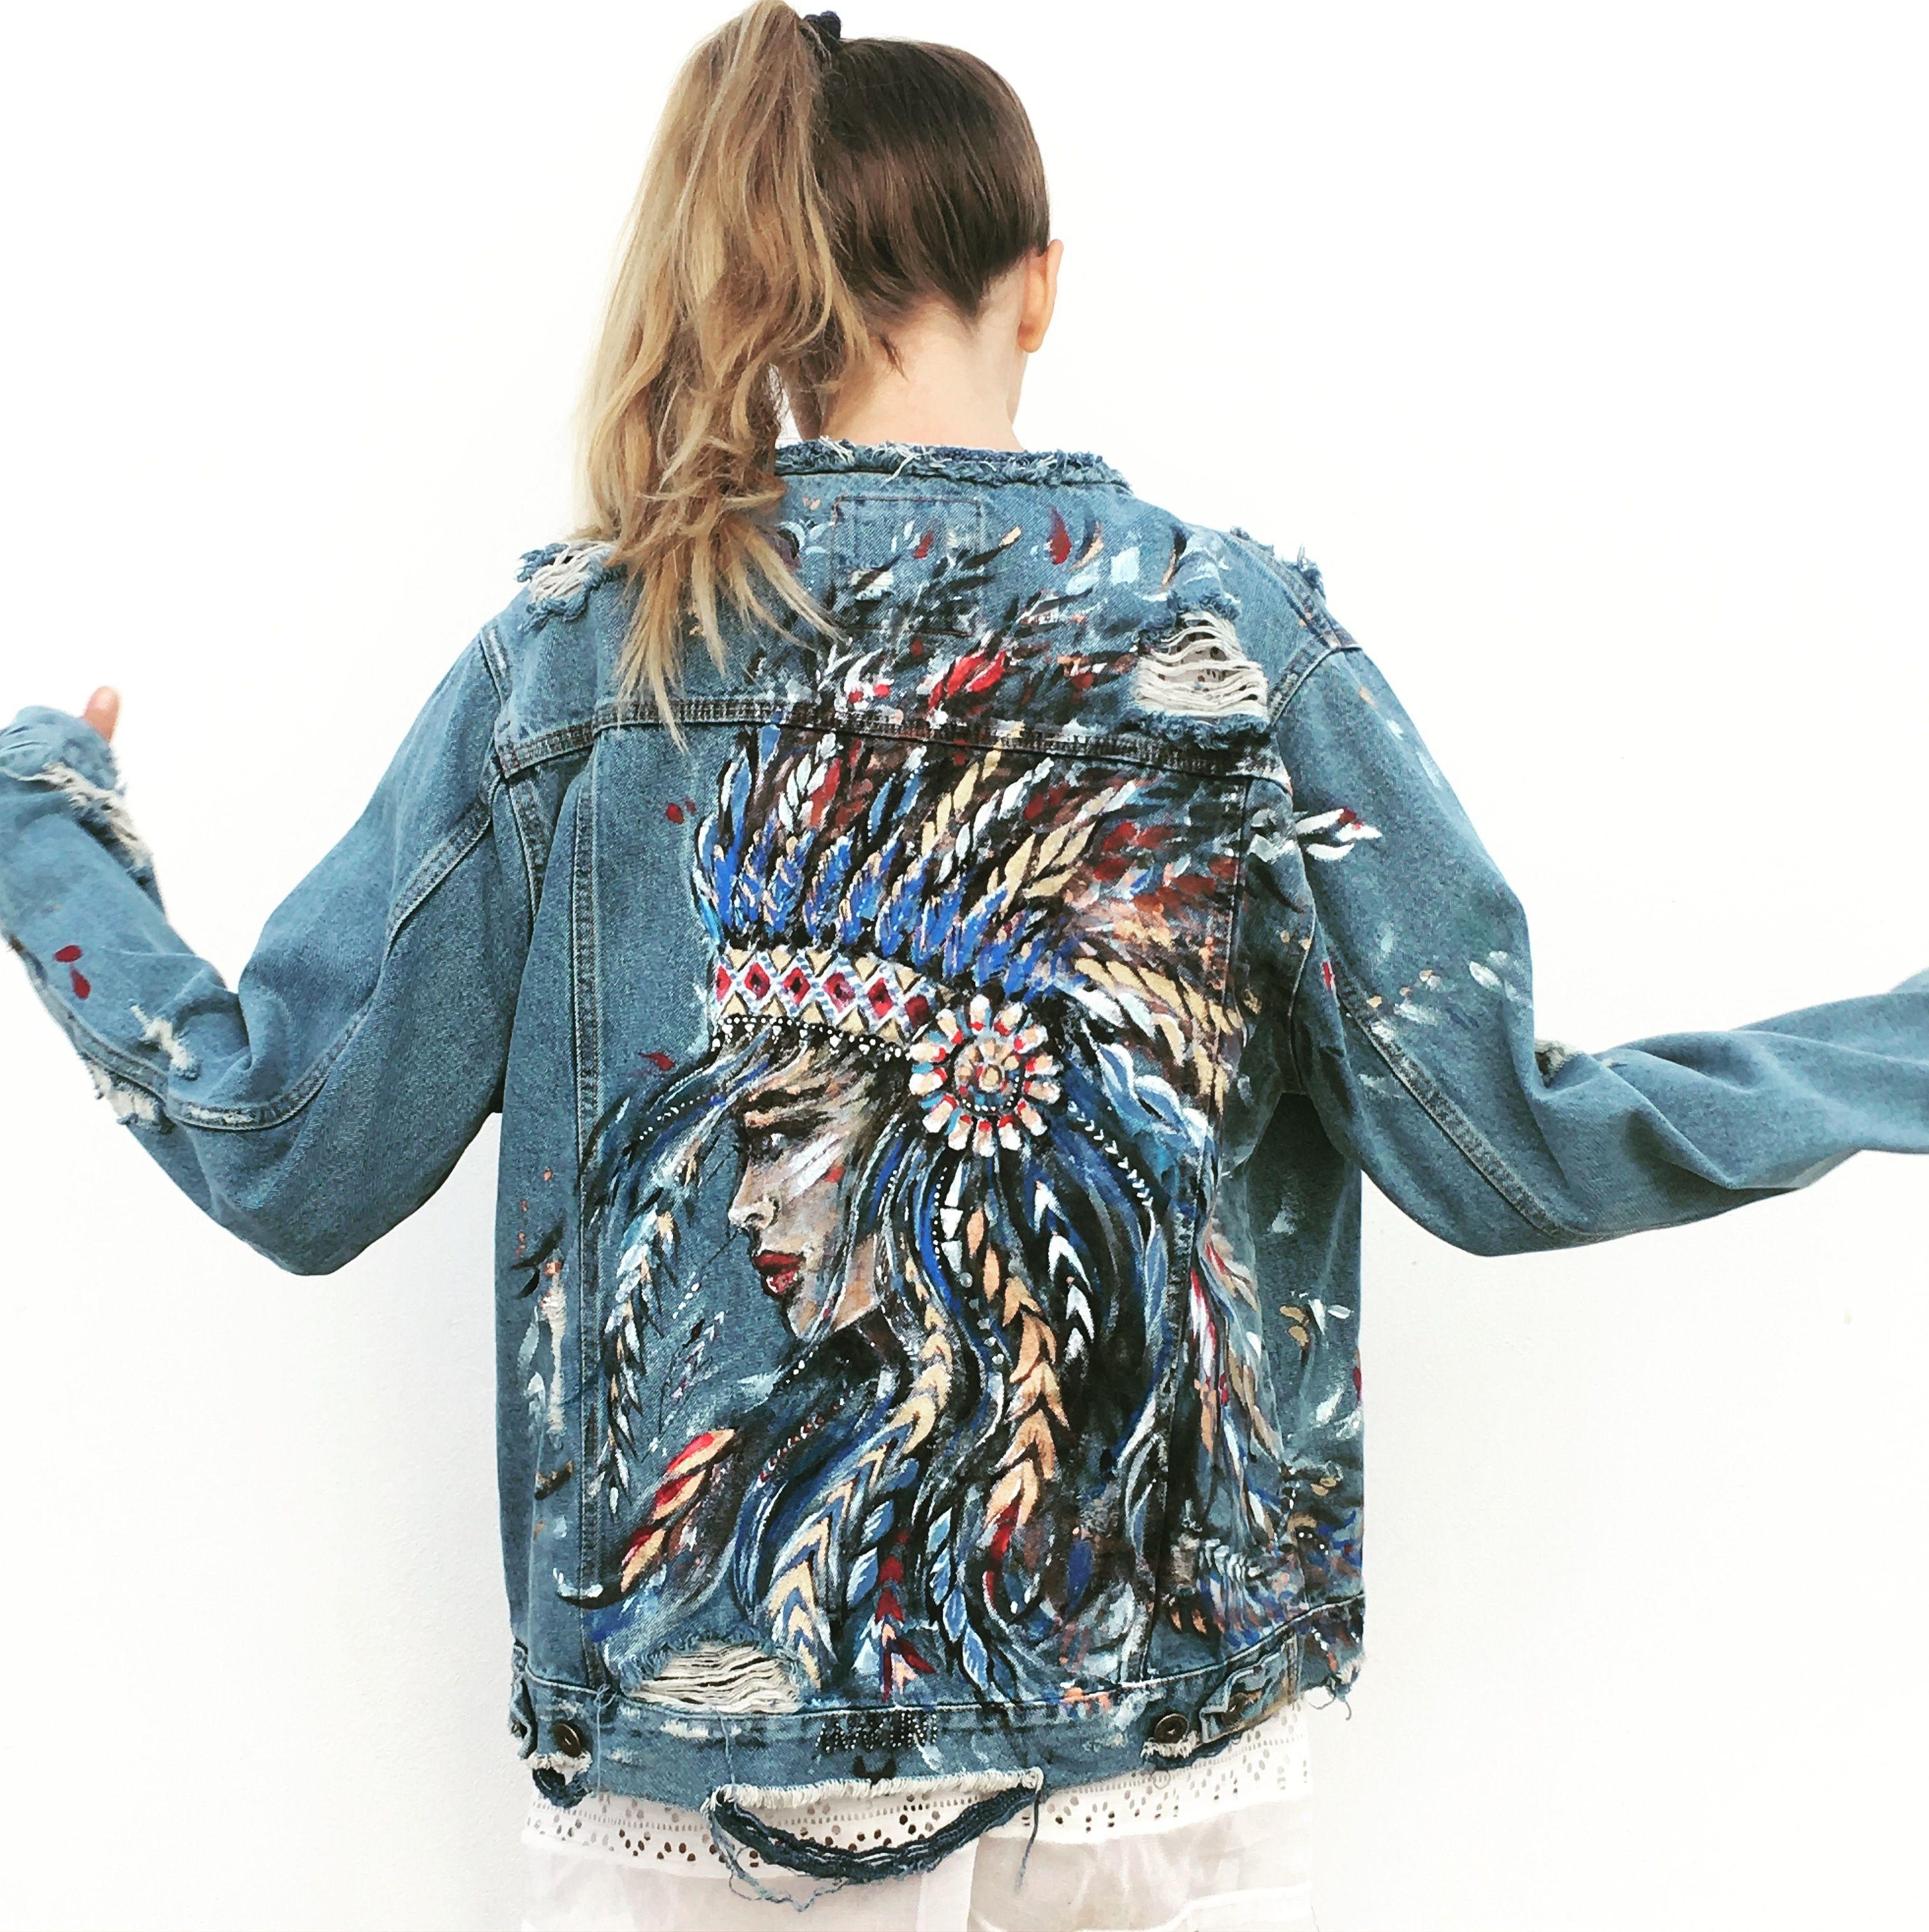 899afeaf0d40d Hand painted denim jacket by Ukrainian artist Ana Kuni www.anakuni ...